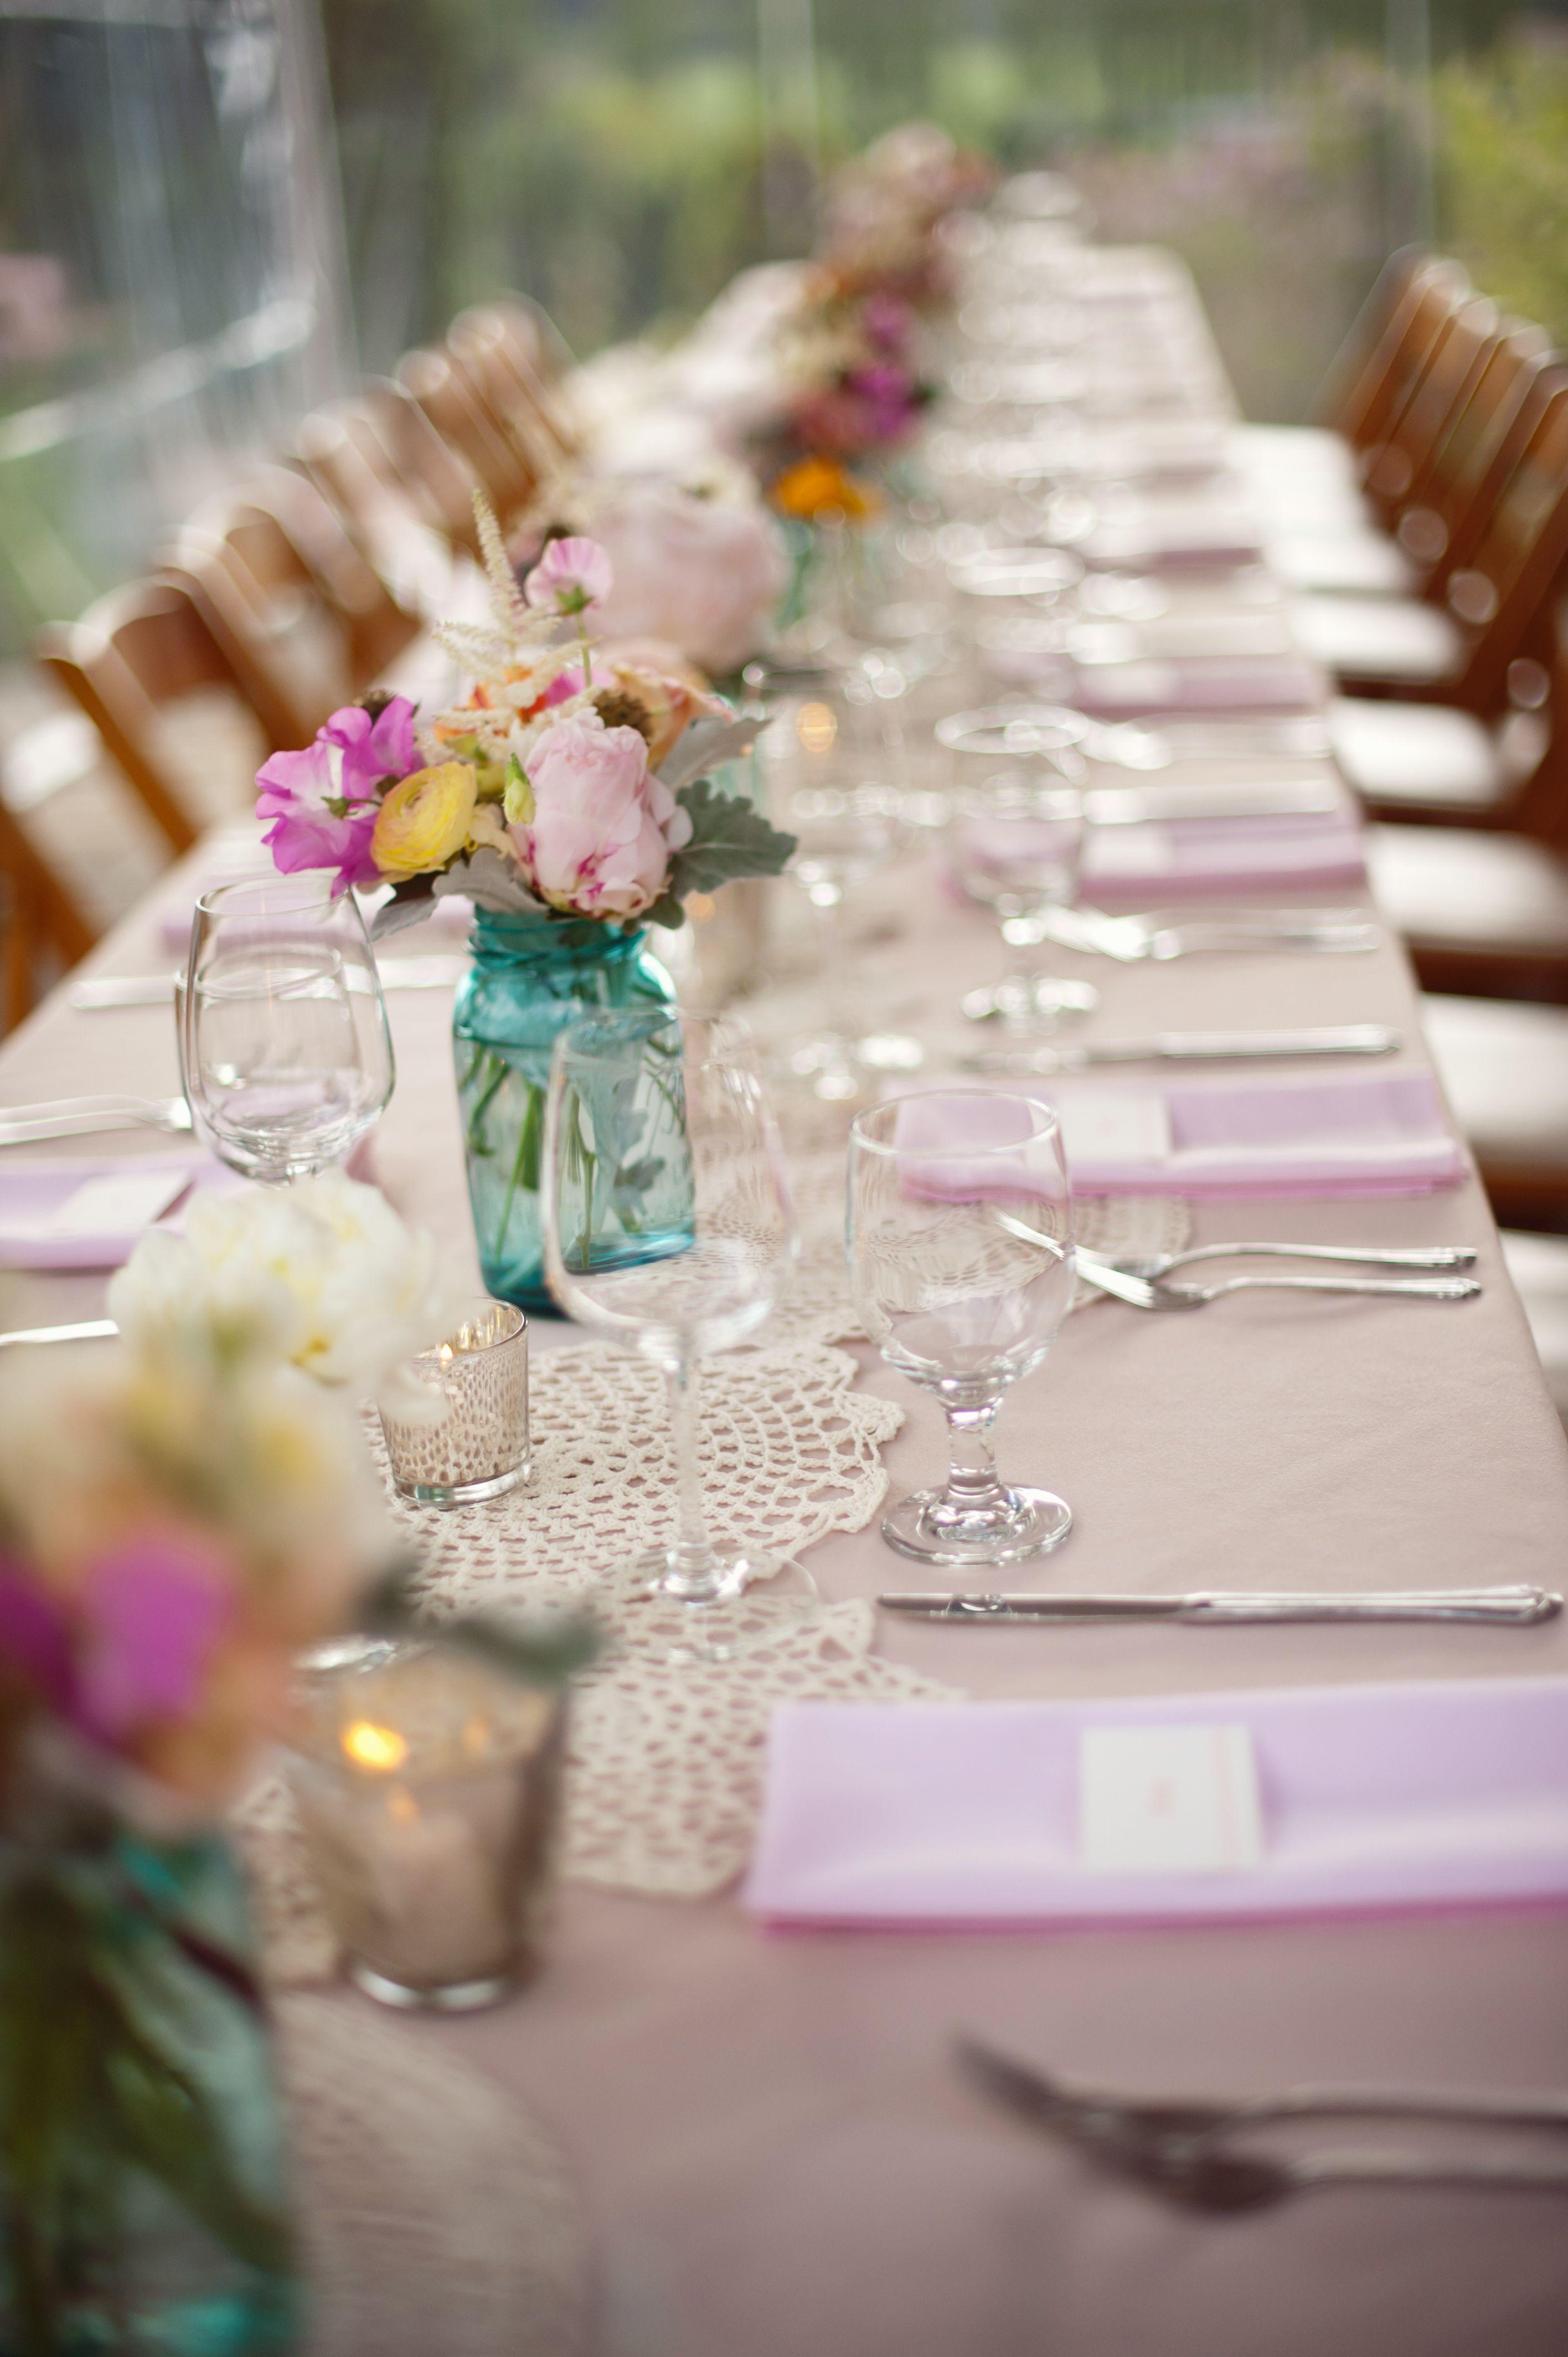 Lavender decor for wedding Blue Mason Jars Doilies Kingus Table Decor Wedding Planning